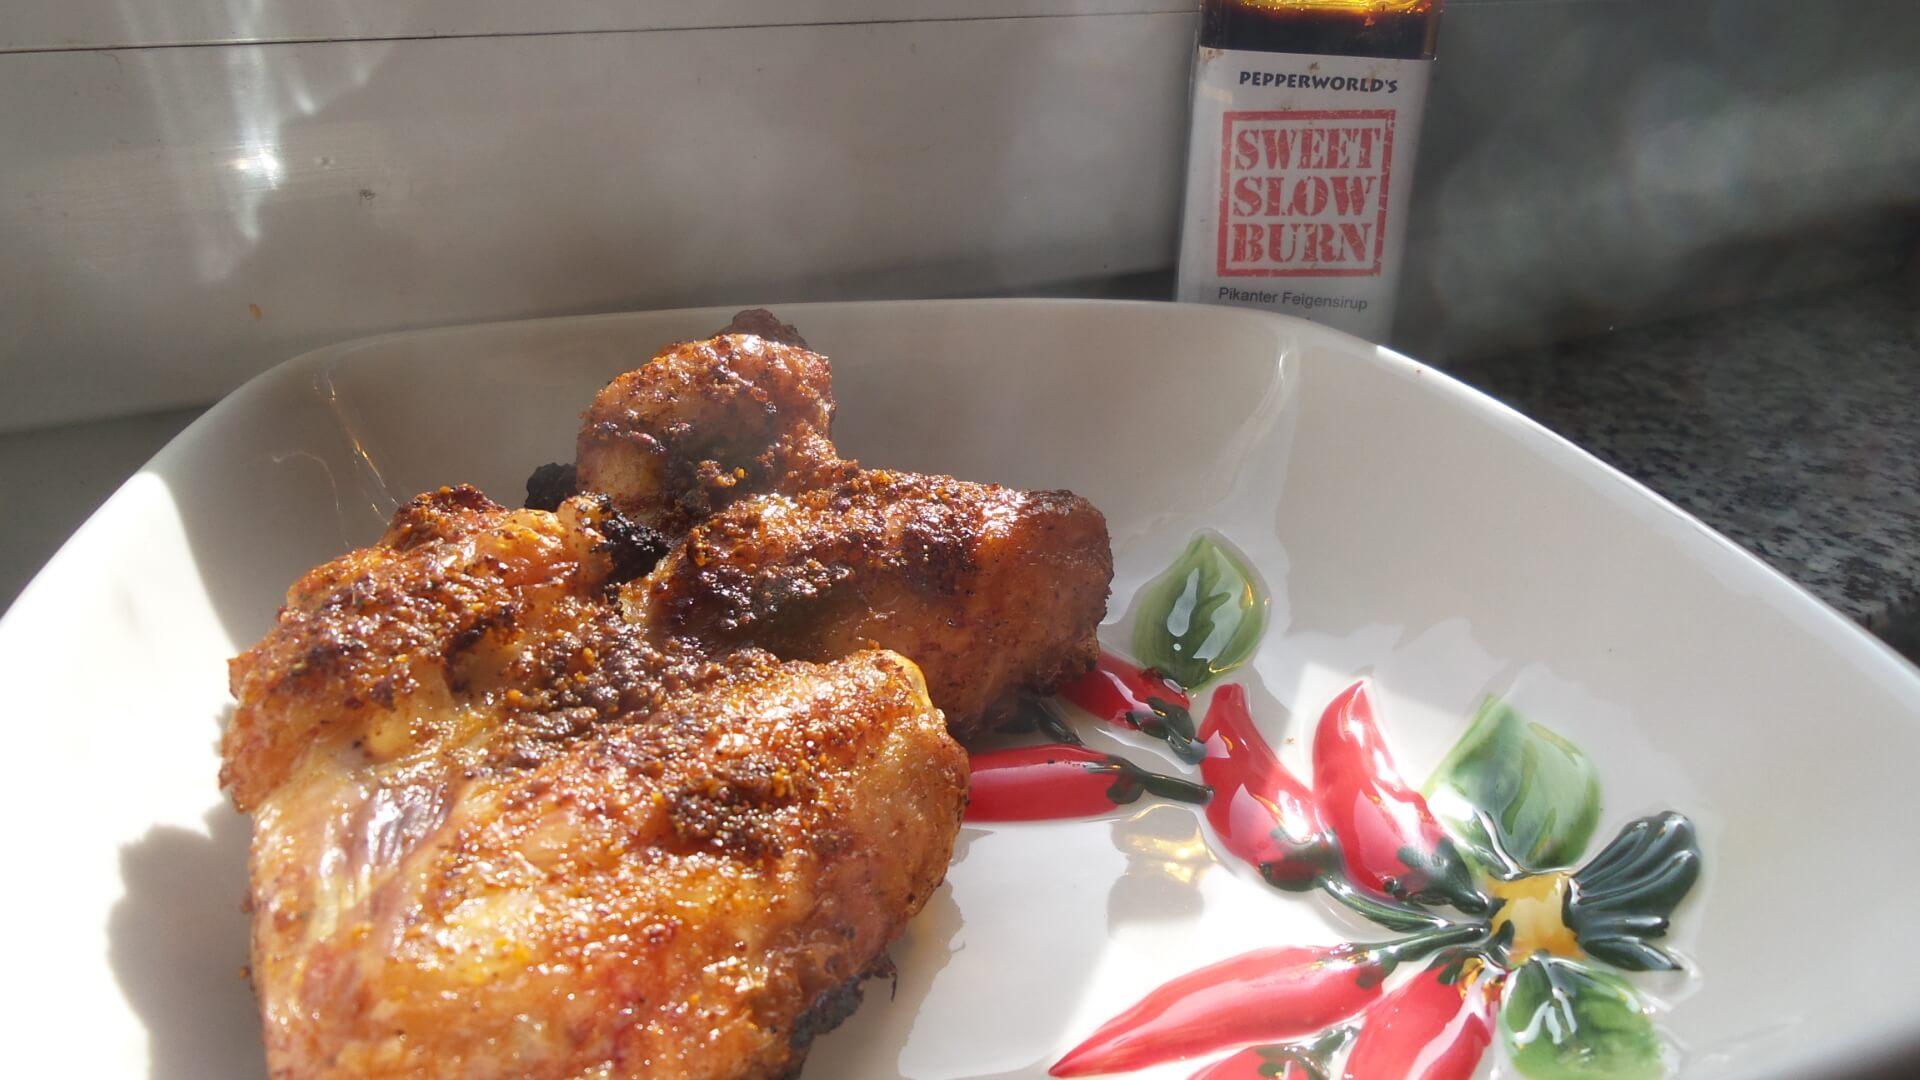 Italien Inspiriertes Chicken Wings Rezept vom Cobb Grill